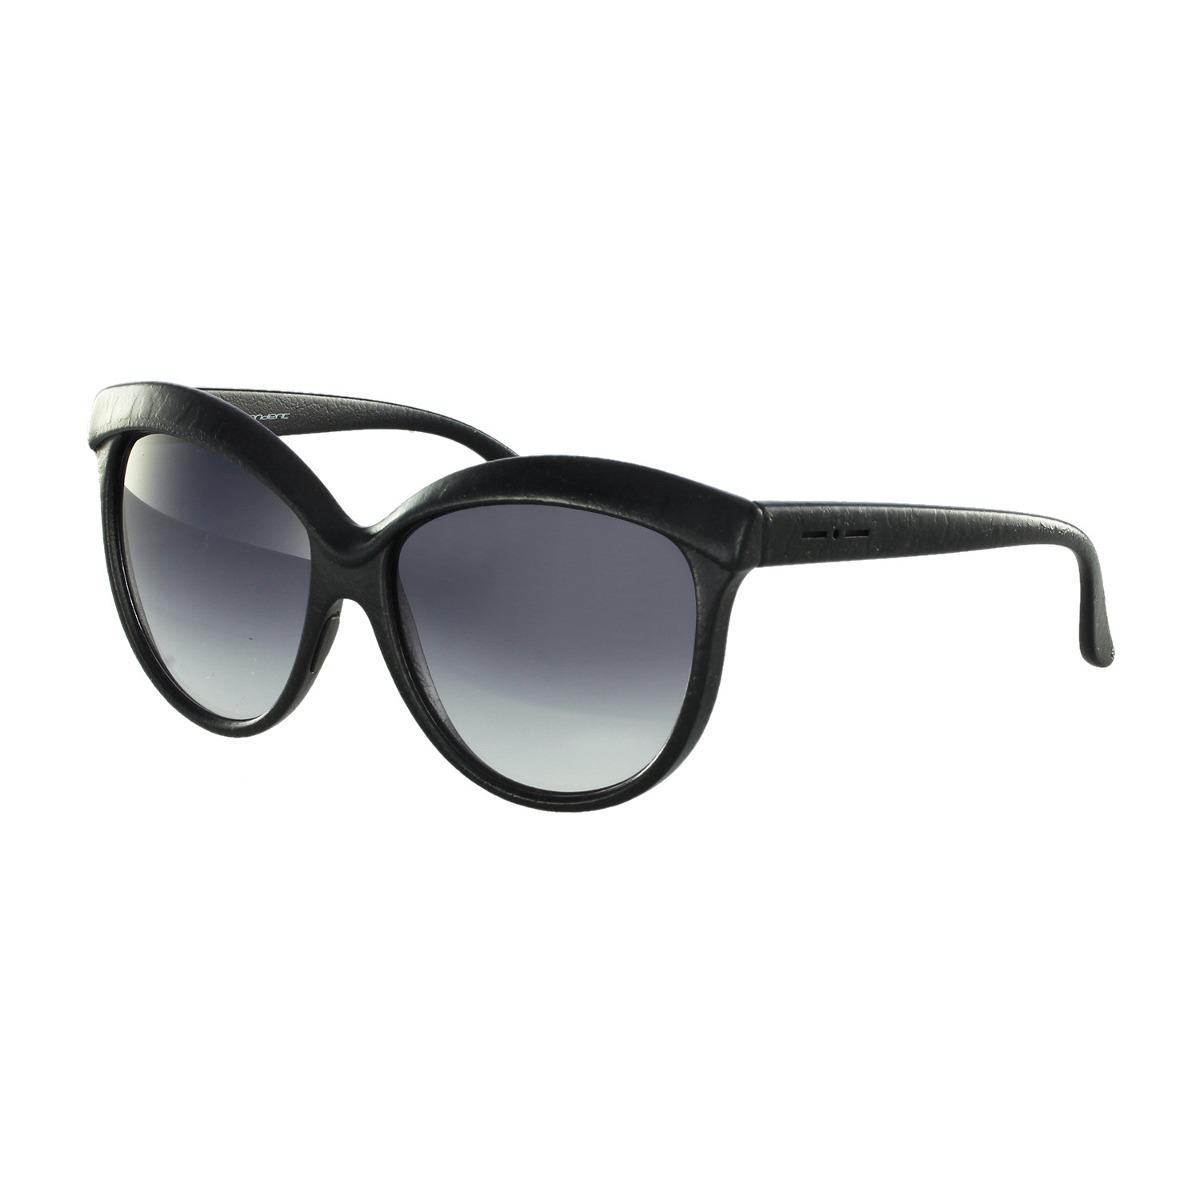 b50af904354d7 óculos de sol italia independent gatinho preto. Carregando zoom.